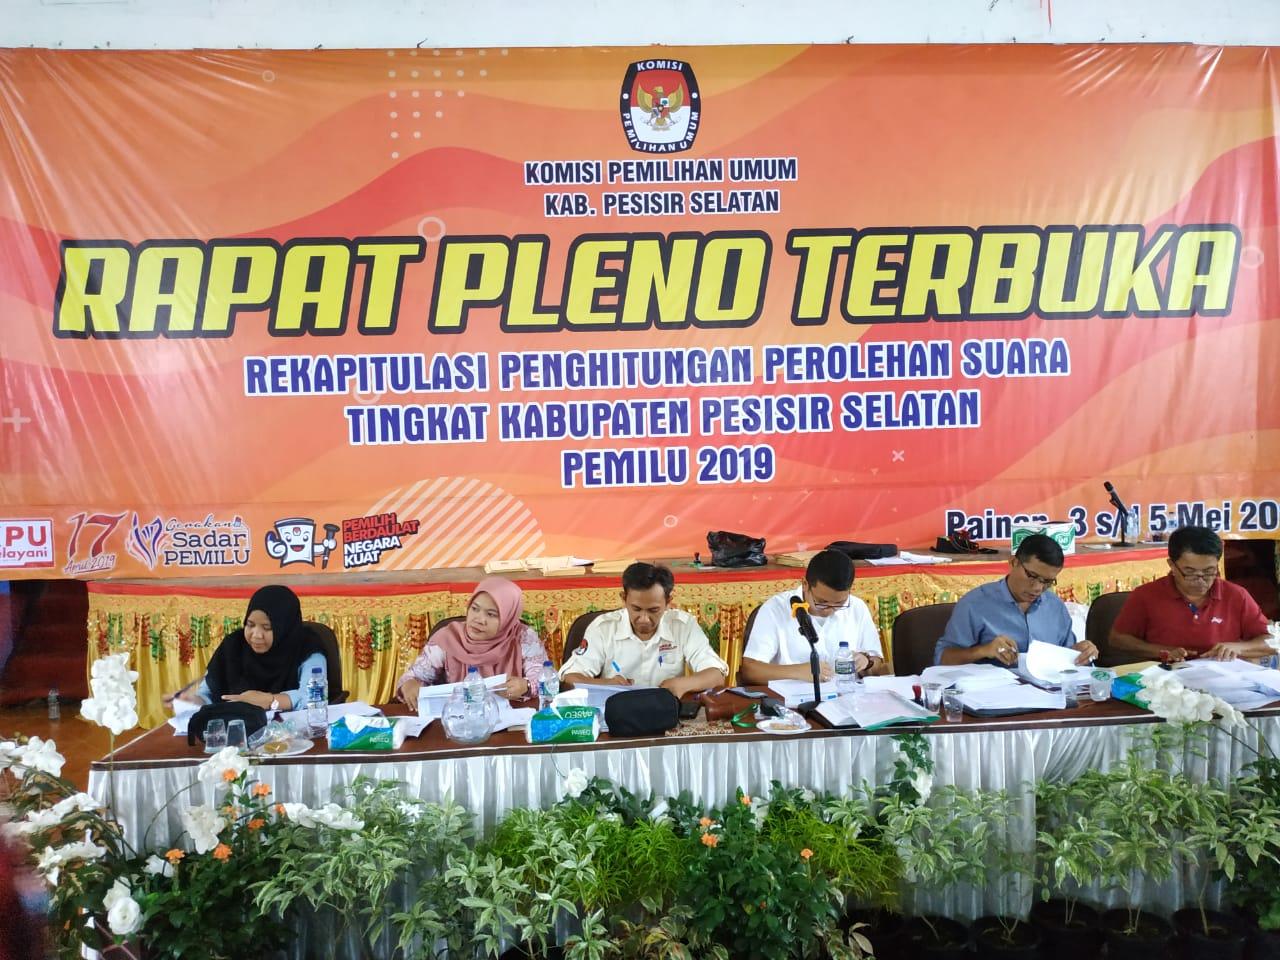 Hasil Rekapitulasi Perolehan Suara Pemilu Tahun 2019 Kabupaten Pesisir Selatan